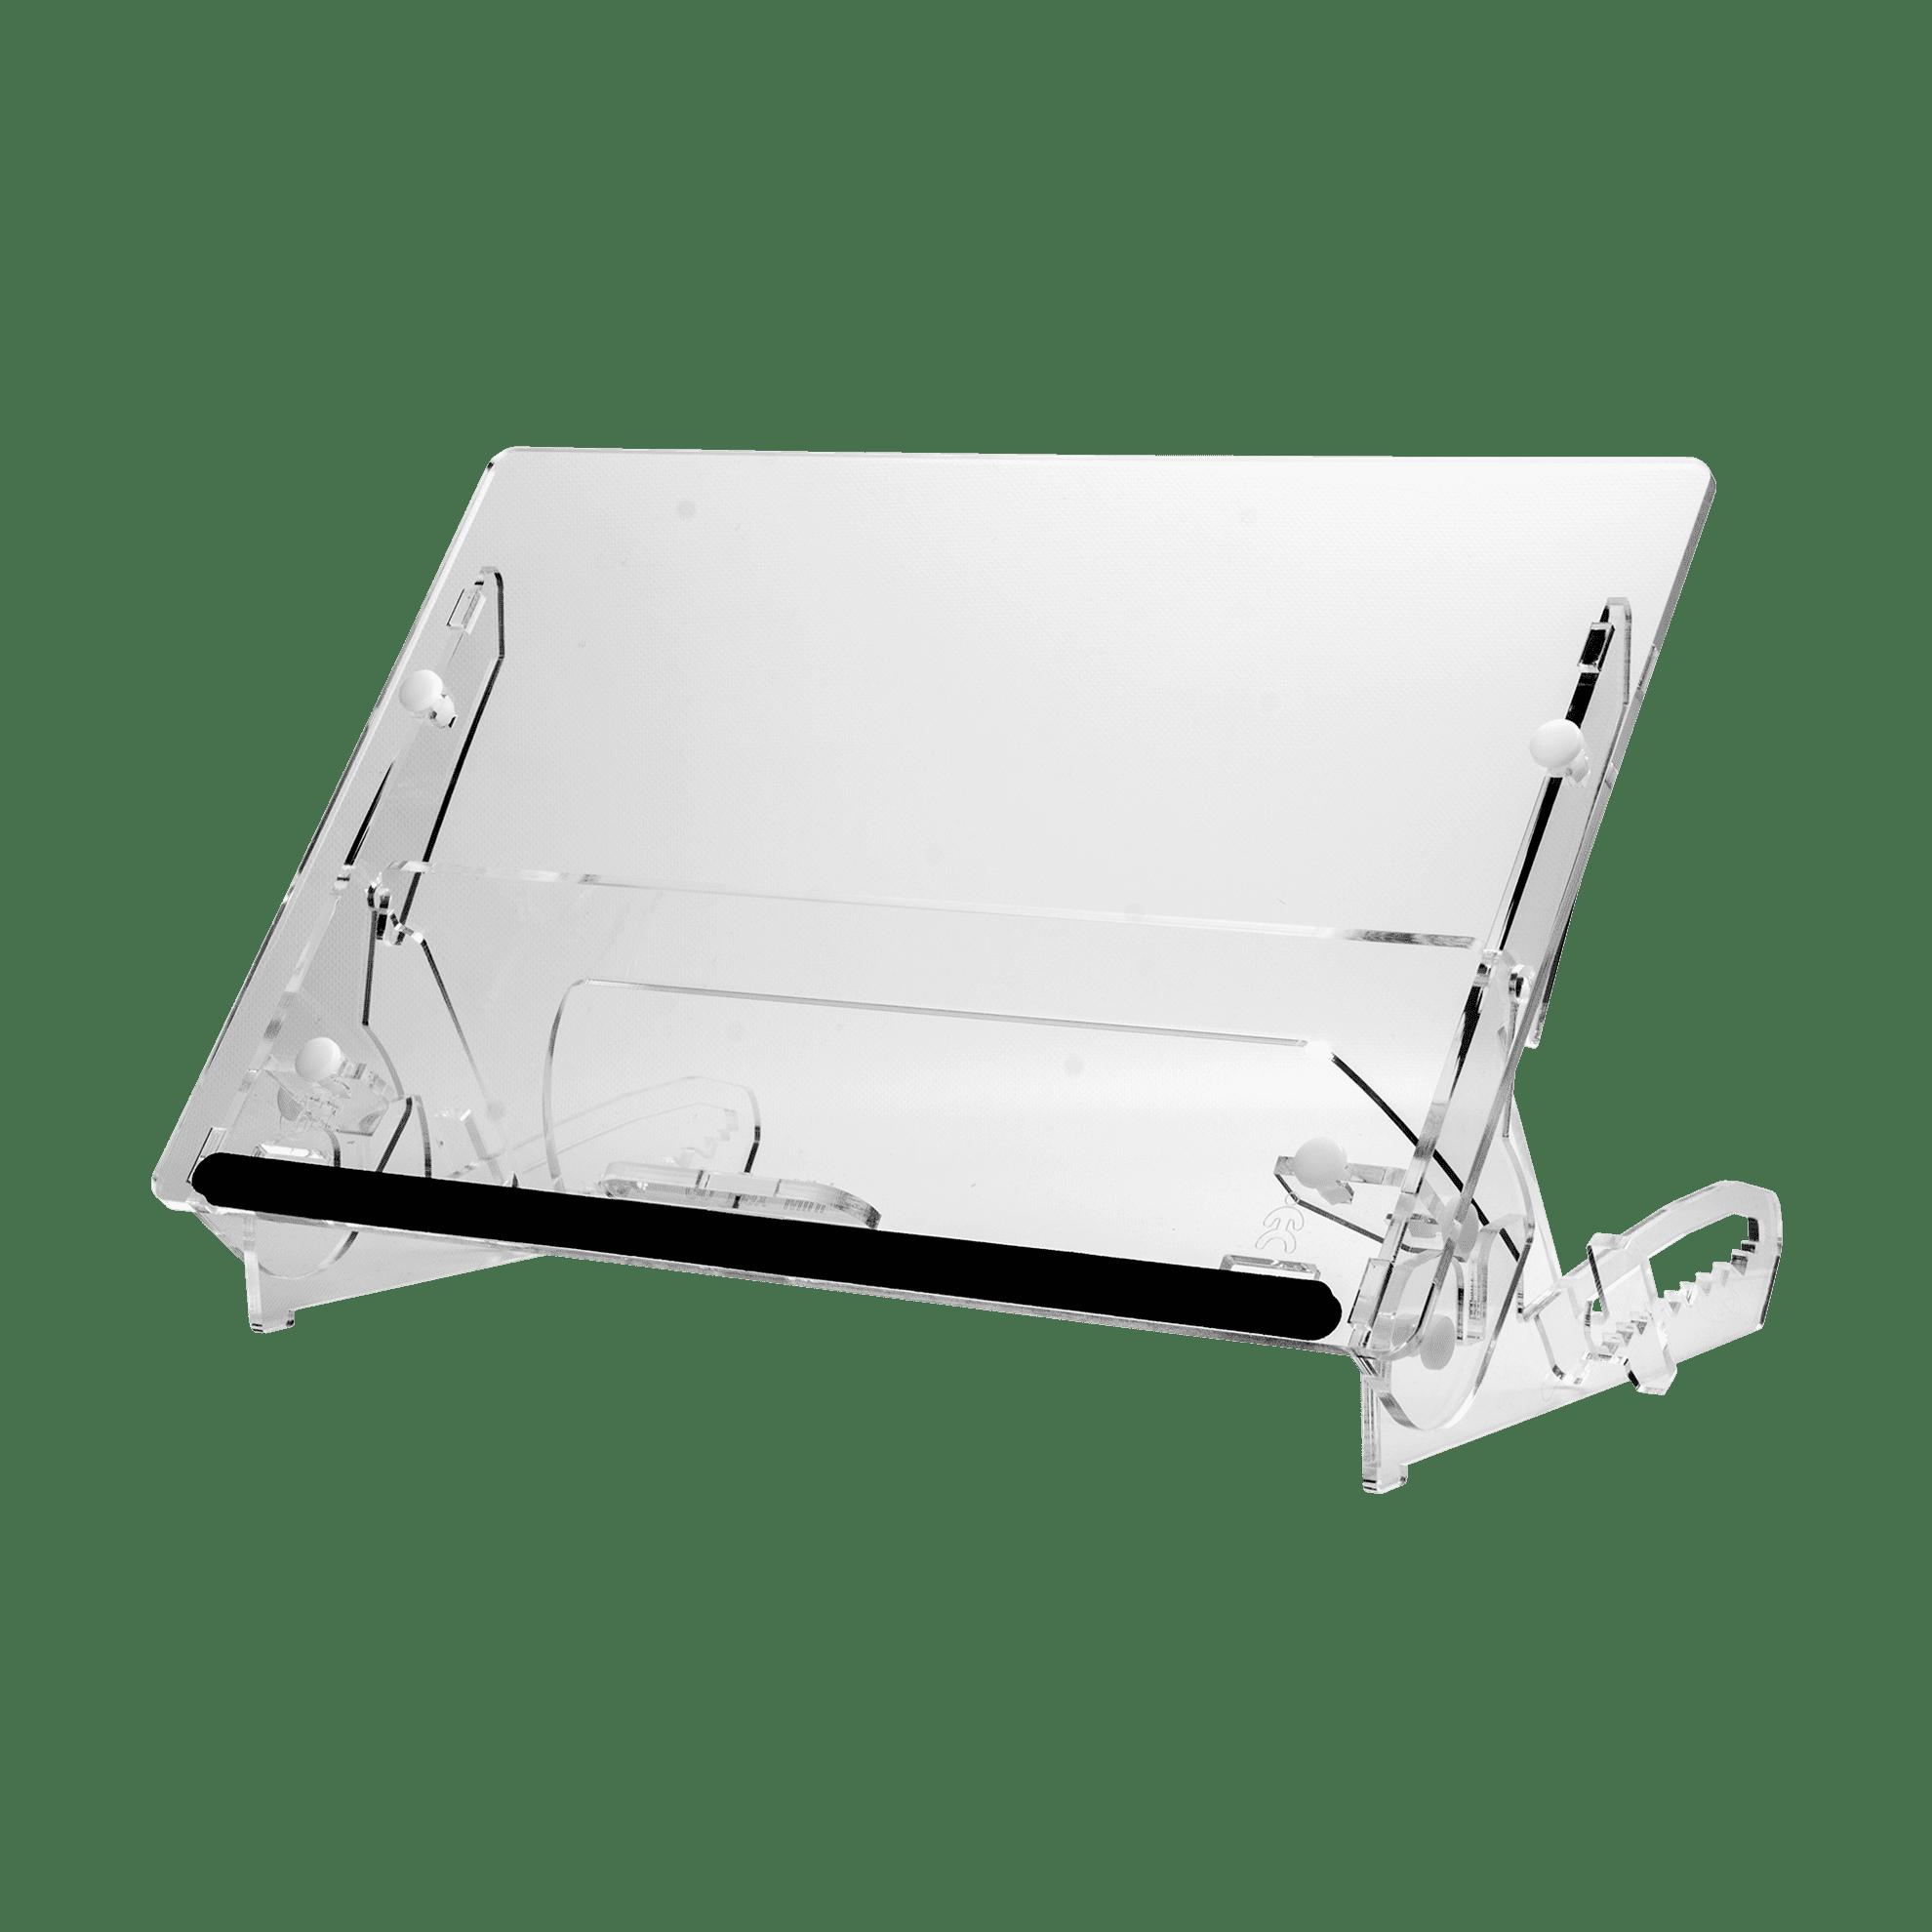 go-flex multifunctional documenthouder ergonomische accessoires